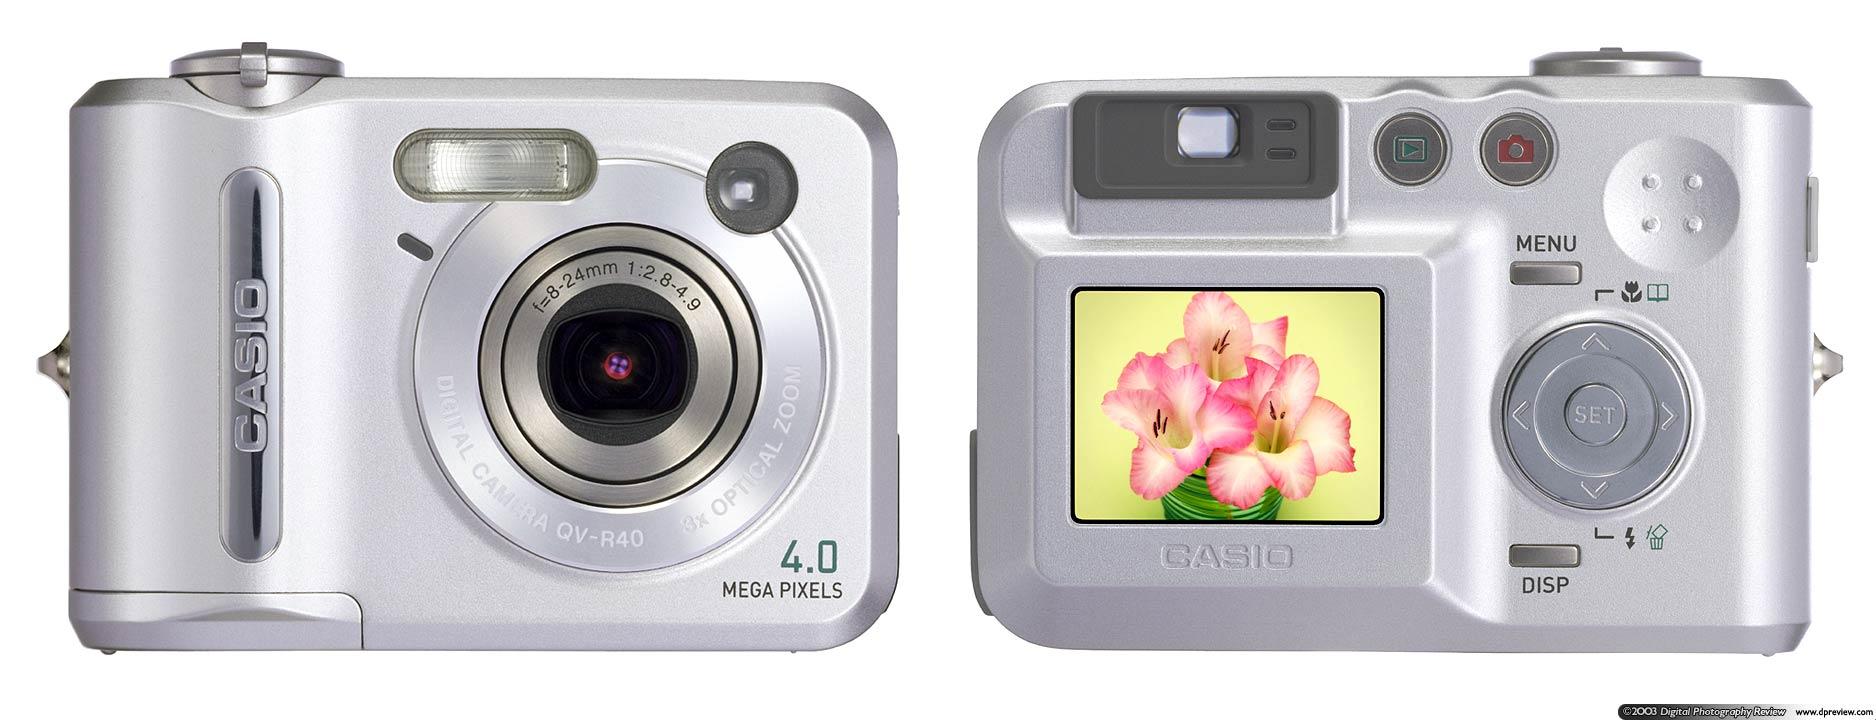 Casio QV-R40: Digital Photography Review